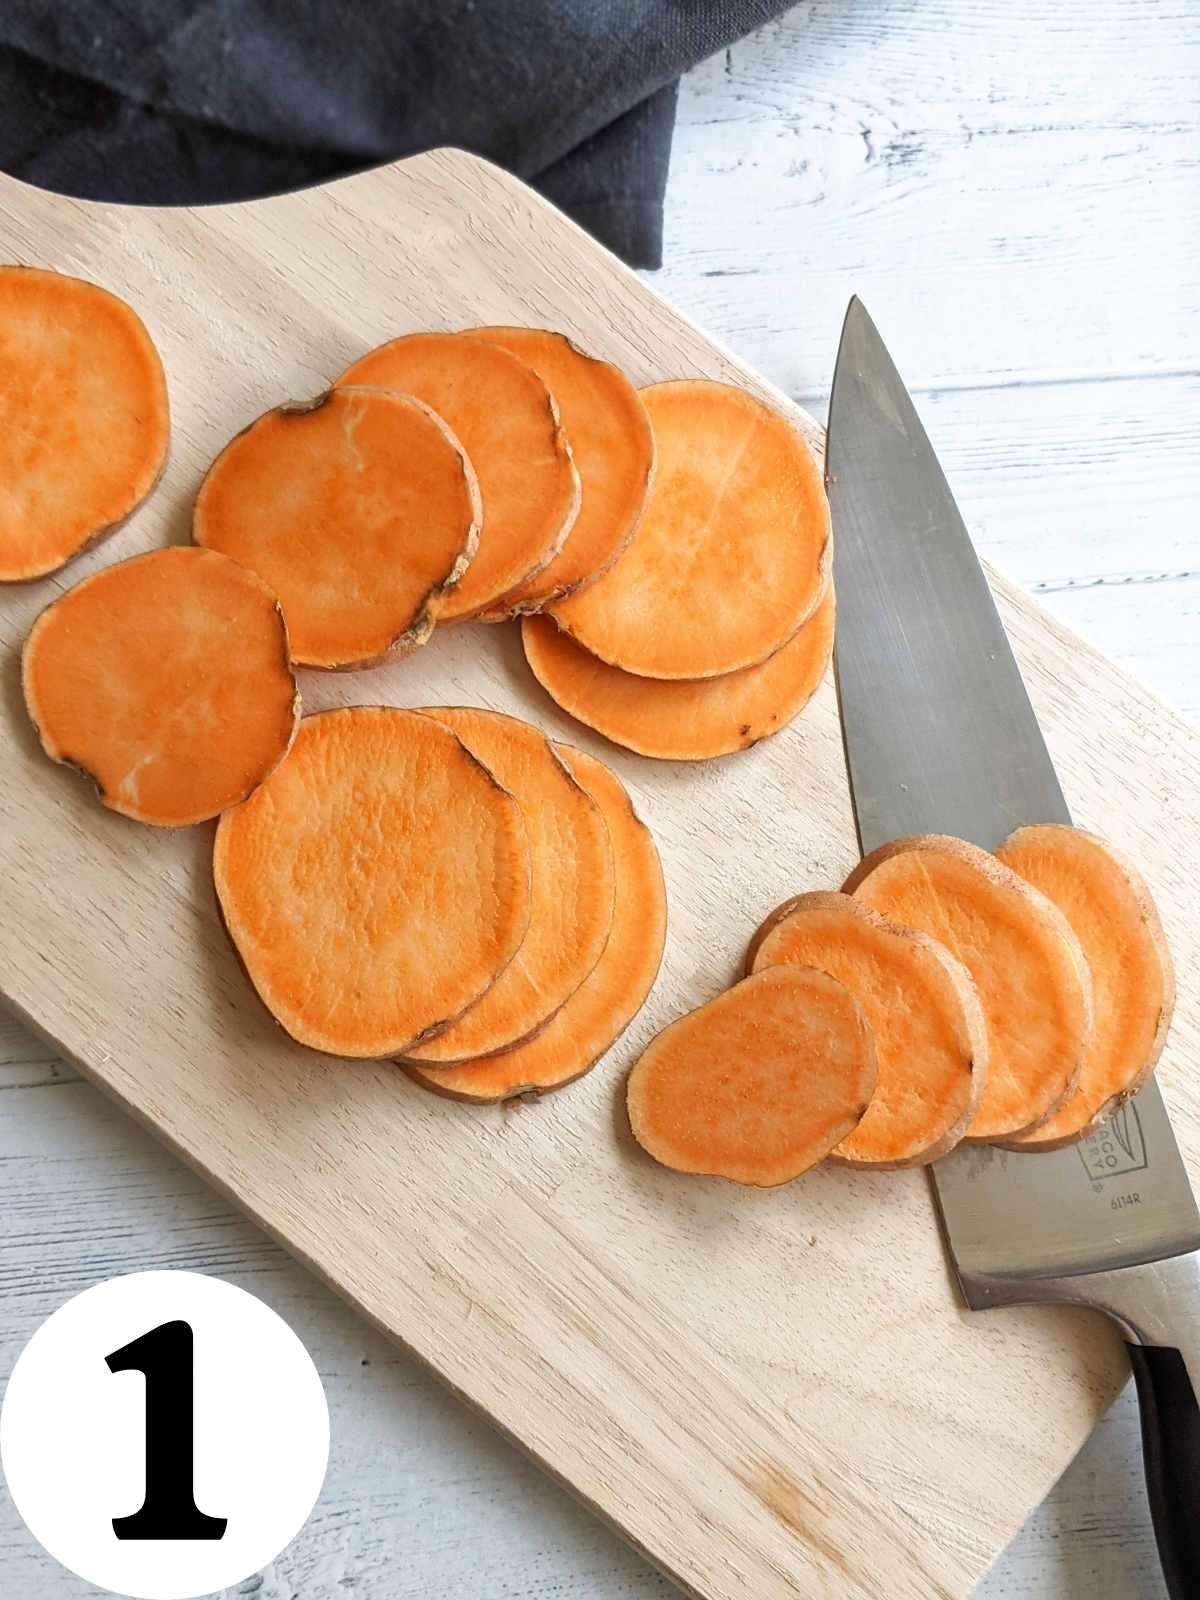 Sliced sweet potato on a cutting board.